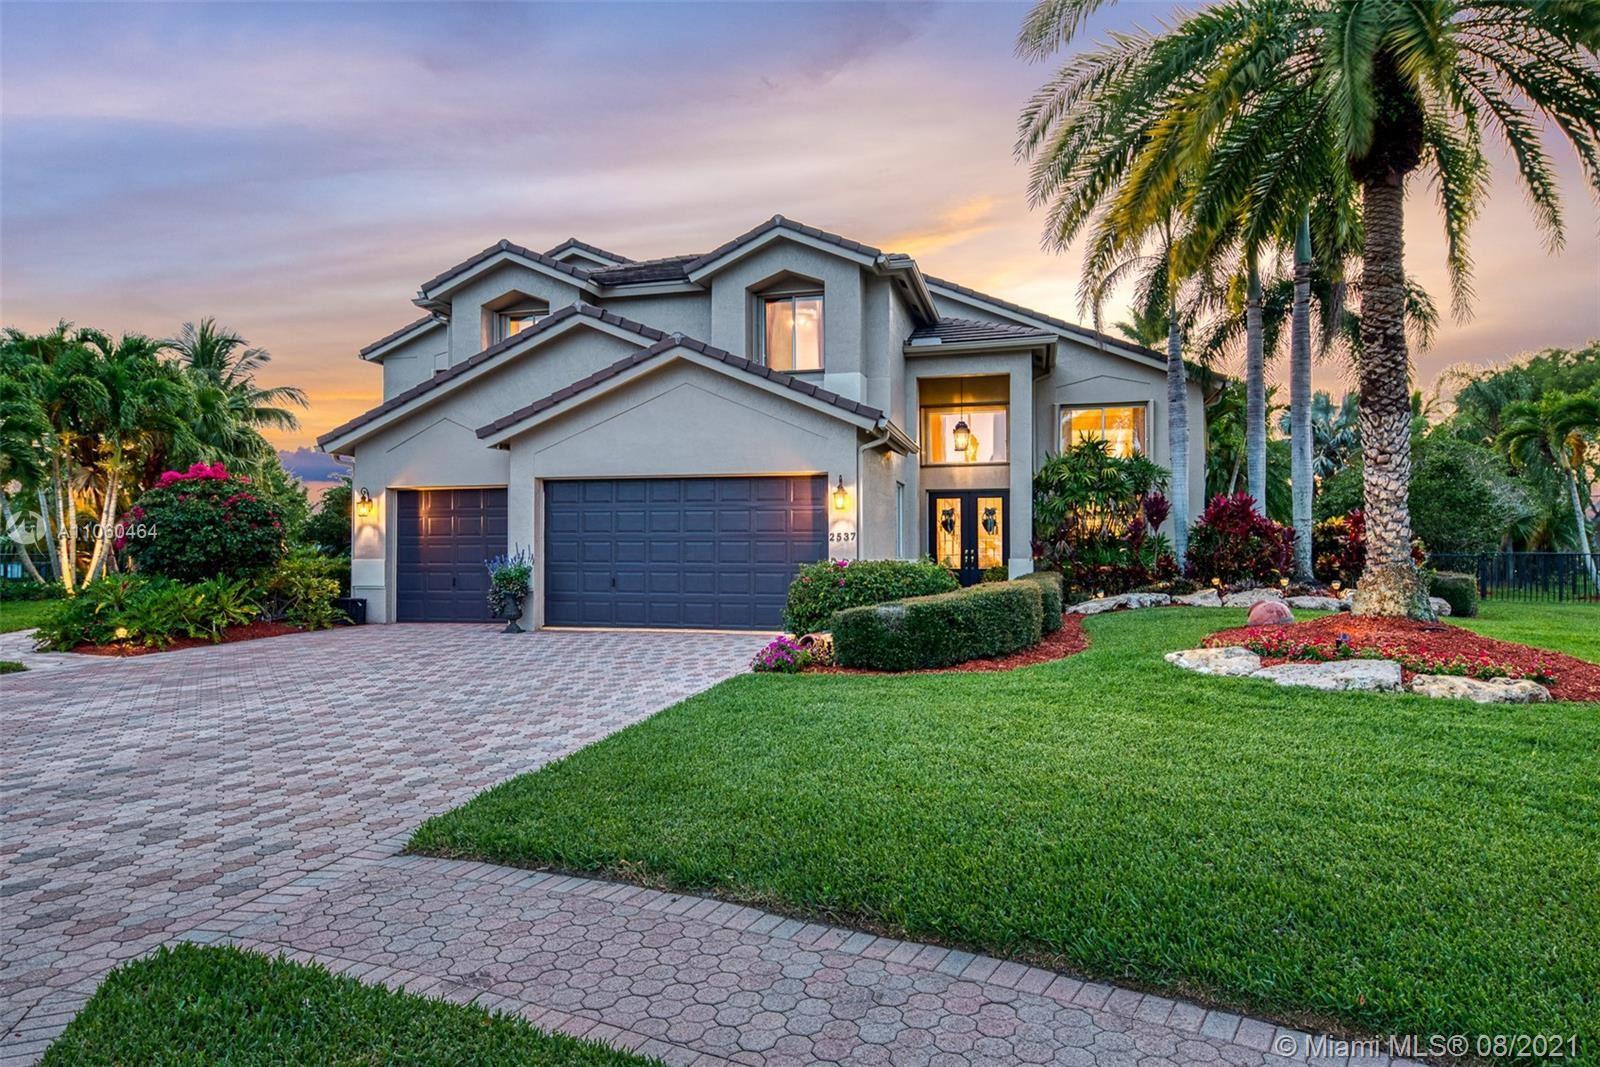 Photo of 2537 SW Park Meadows TR, Palm City, FL 34990 (MLS # A11060464)